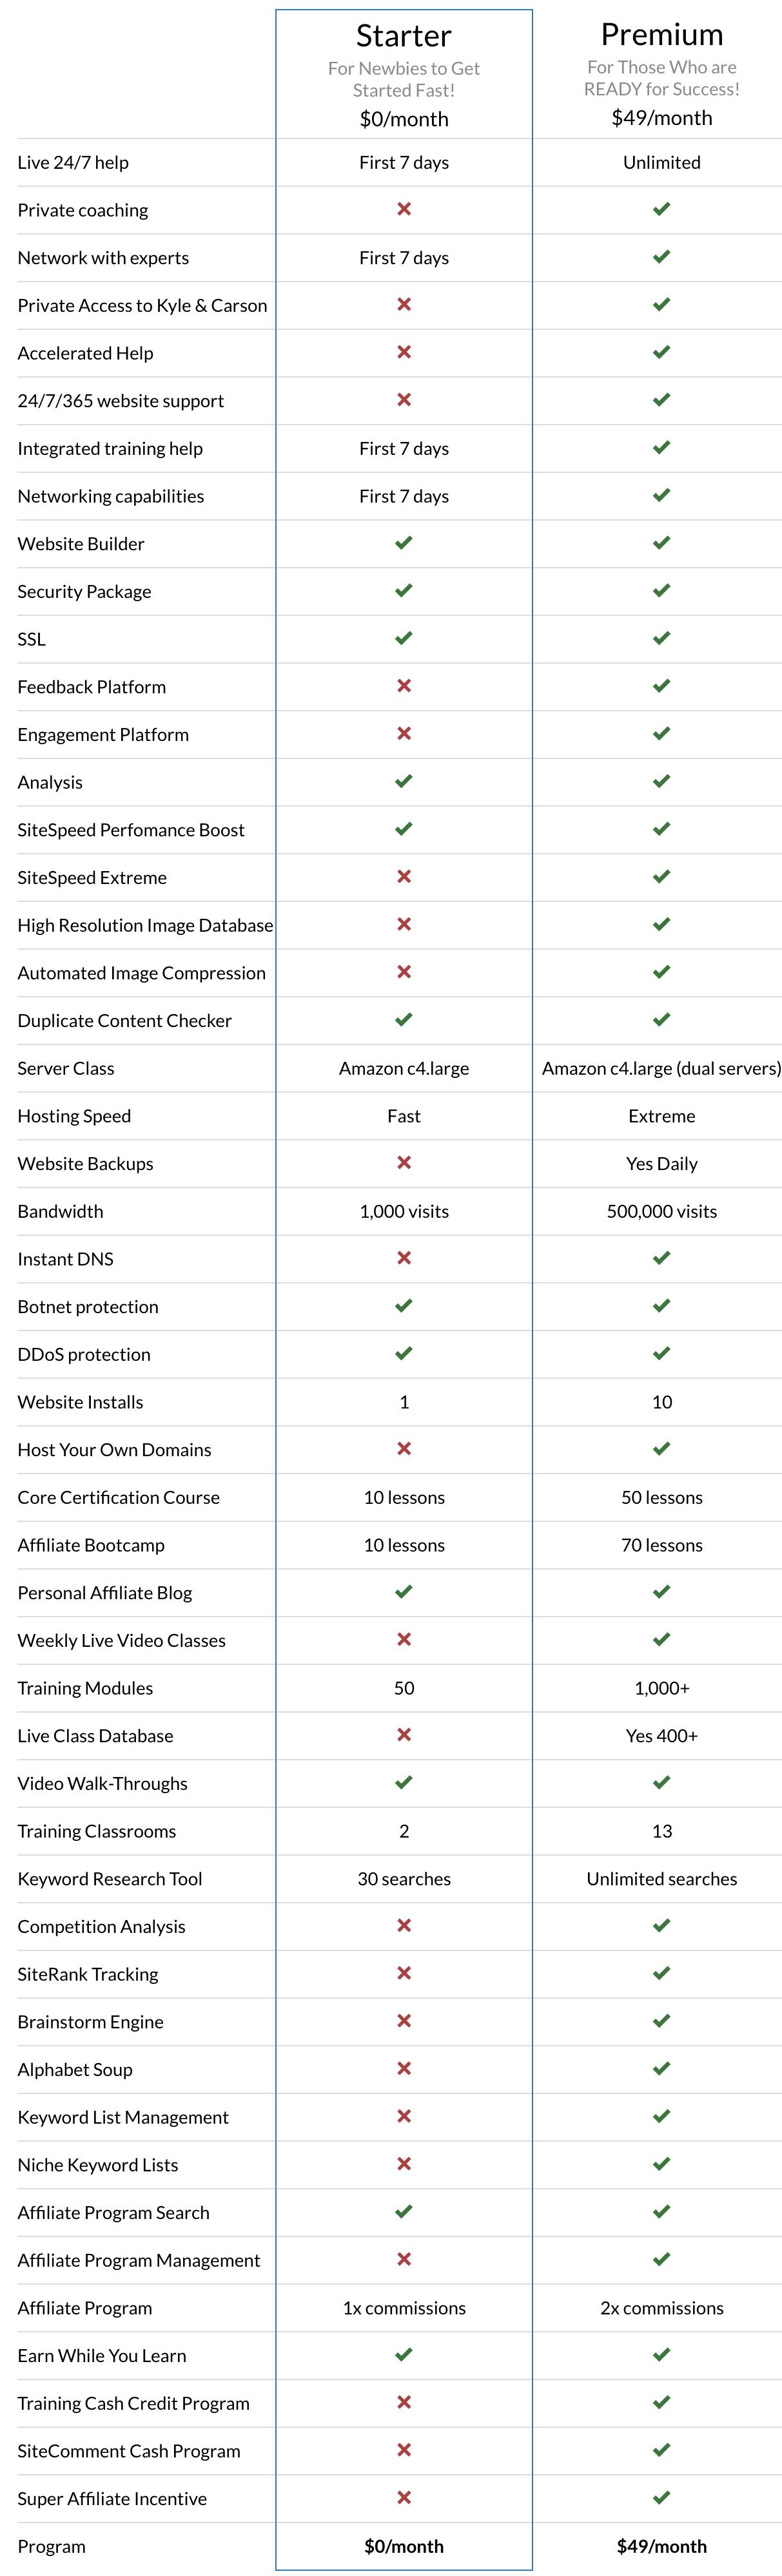 Free vs. Premium Membership Chart